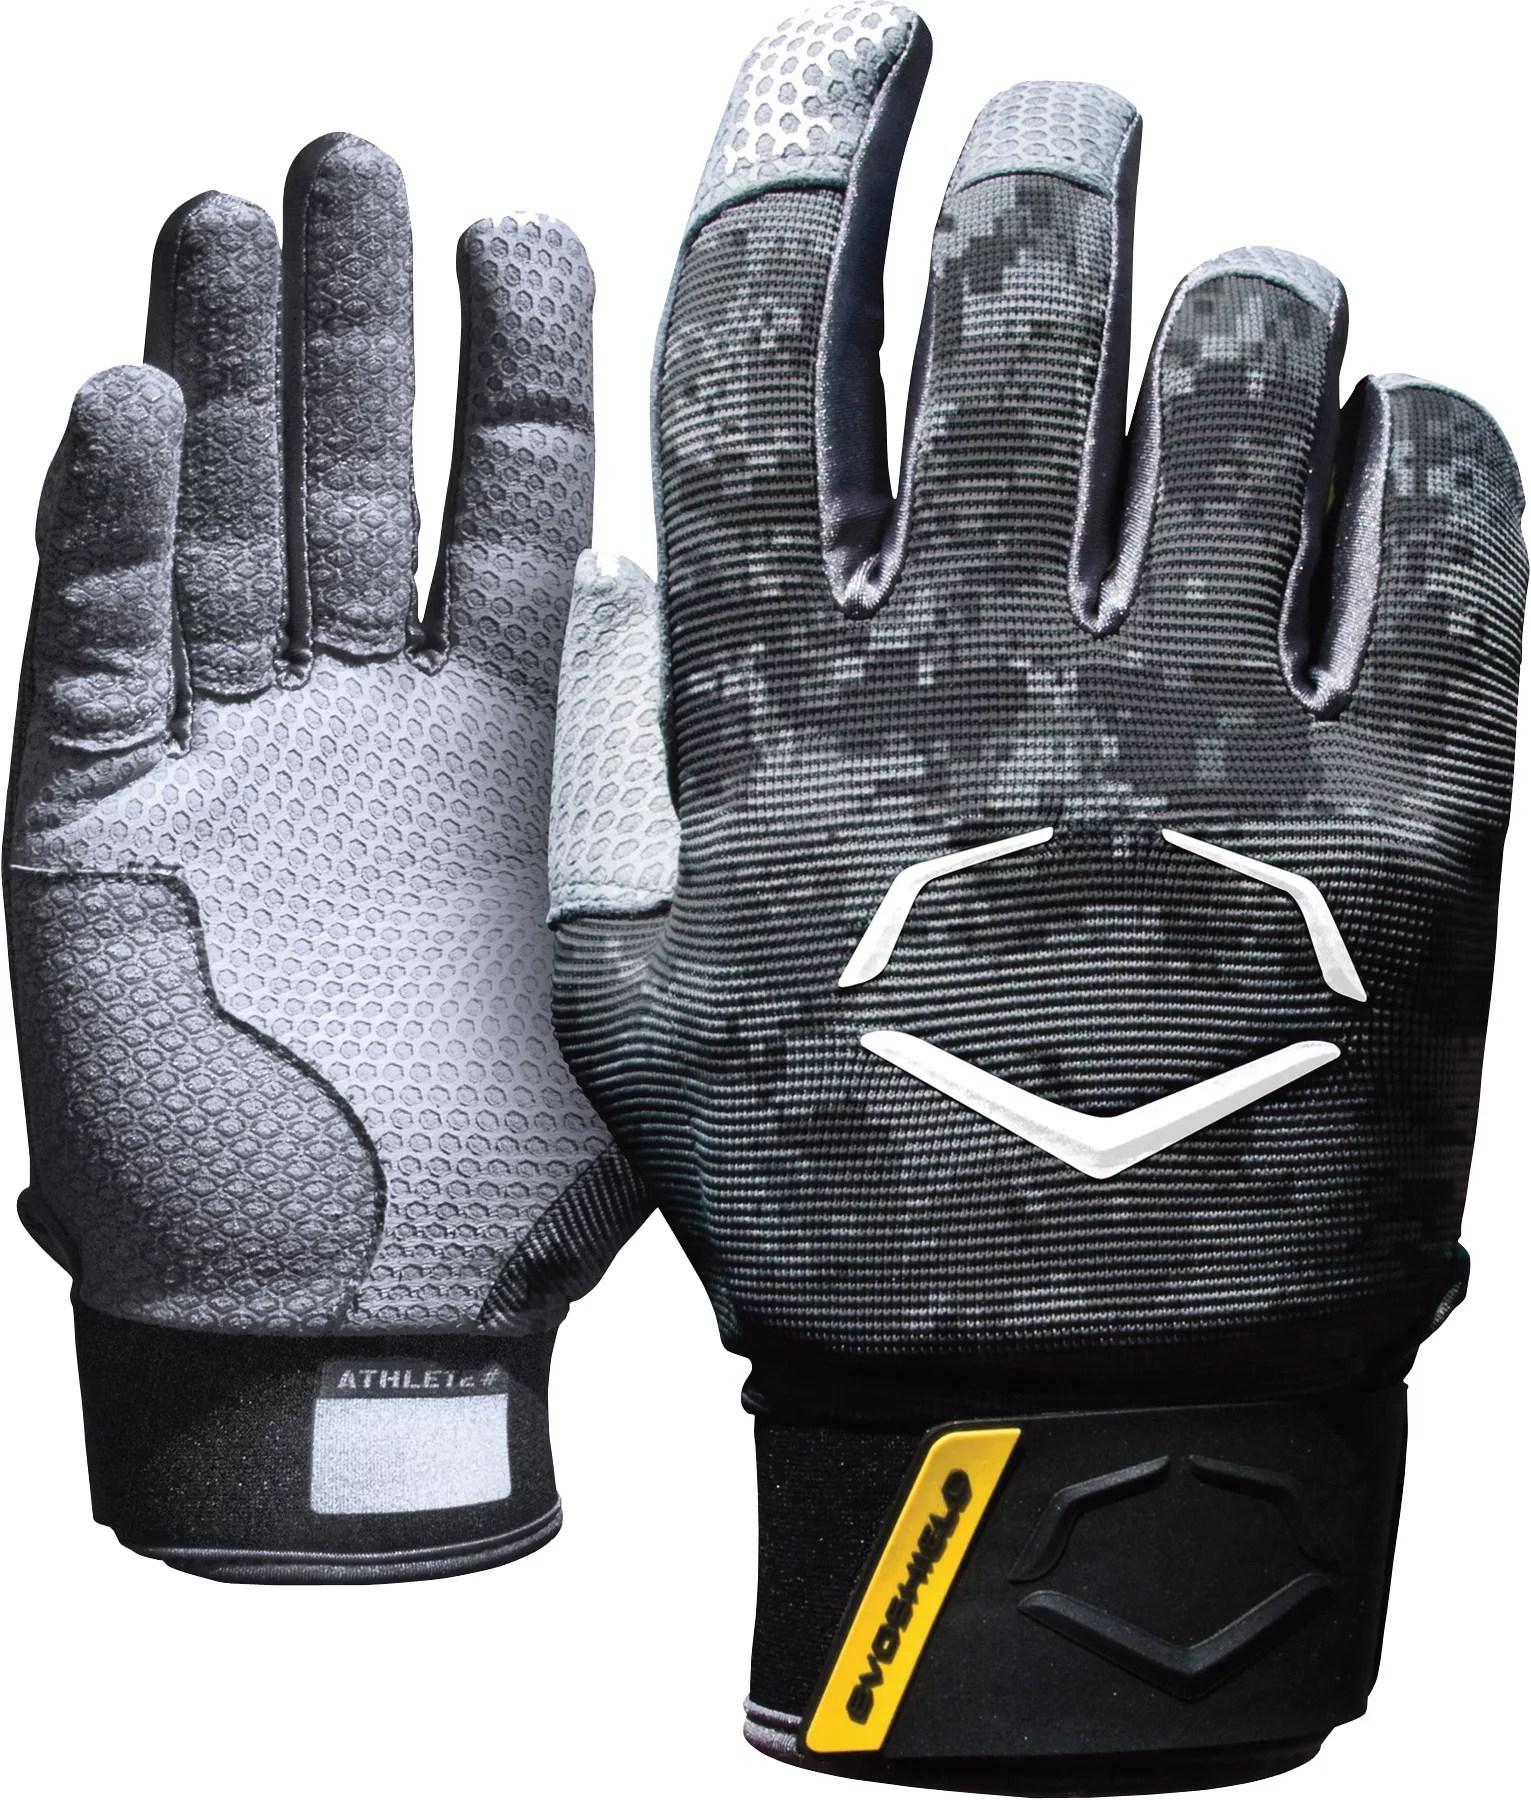 Evoshield adult prostyle protective camo batting gloves noimagefound also dick   rh dickssportinggoods